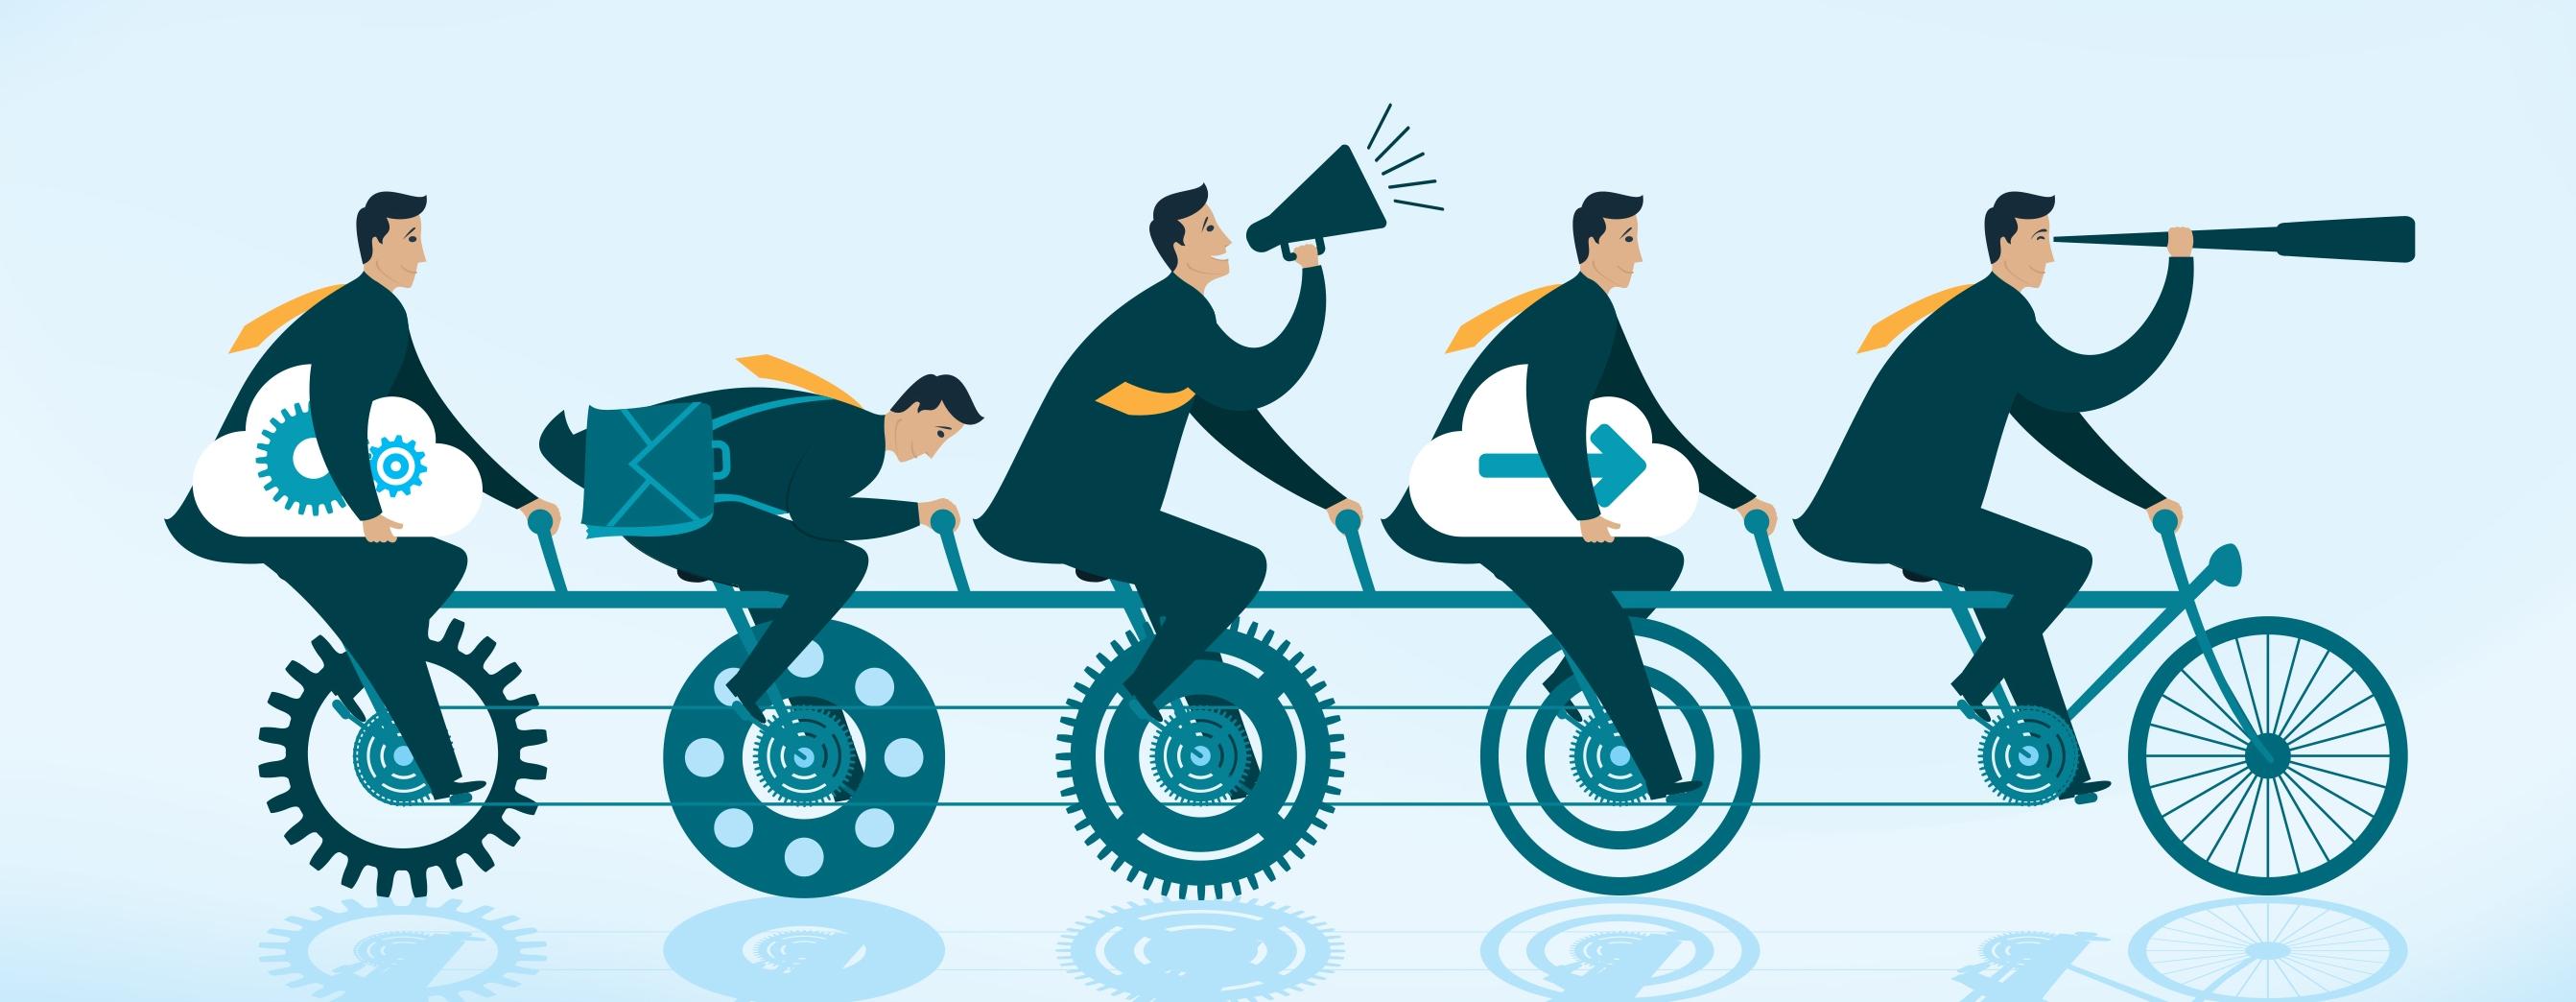 Teamwork-partnership-business-cooperation